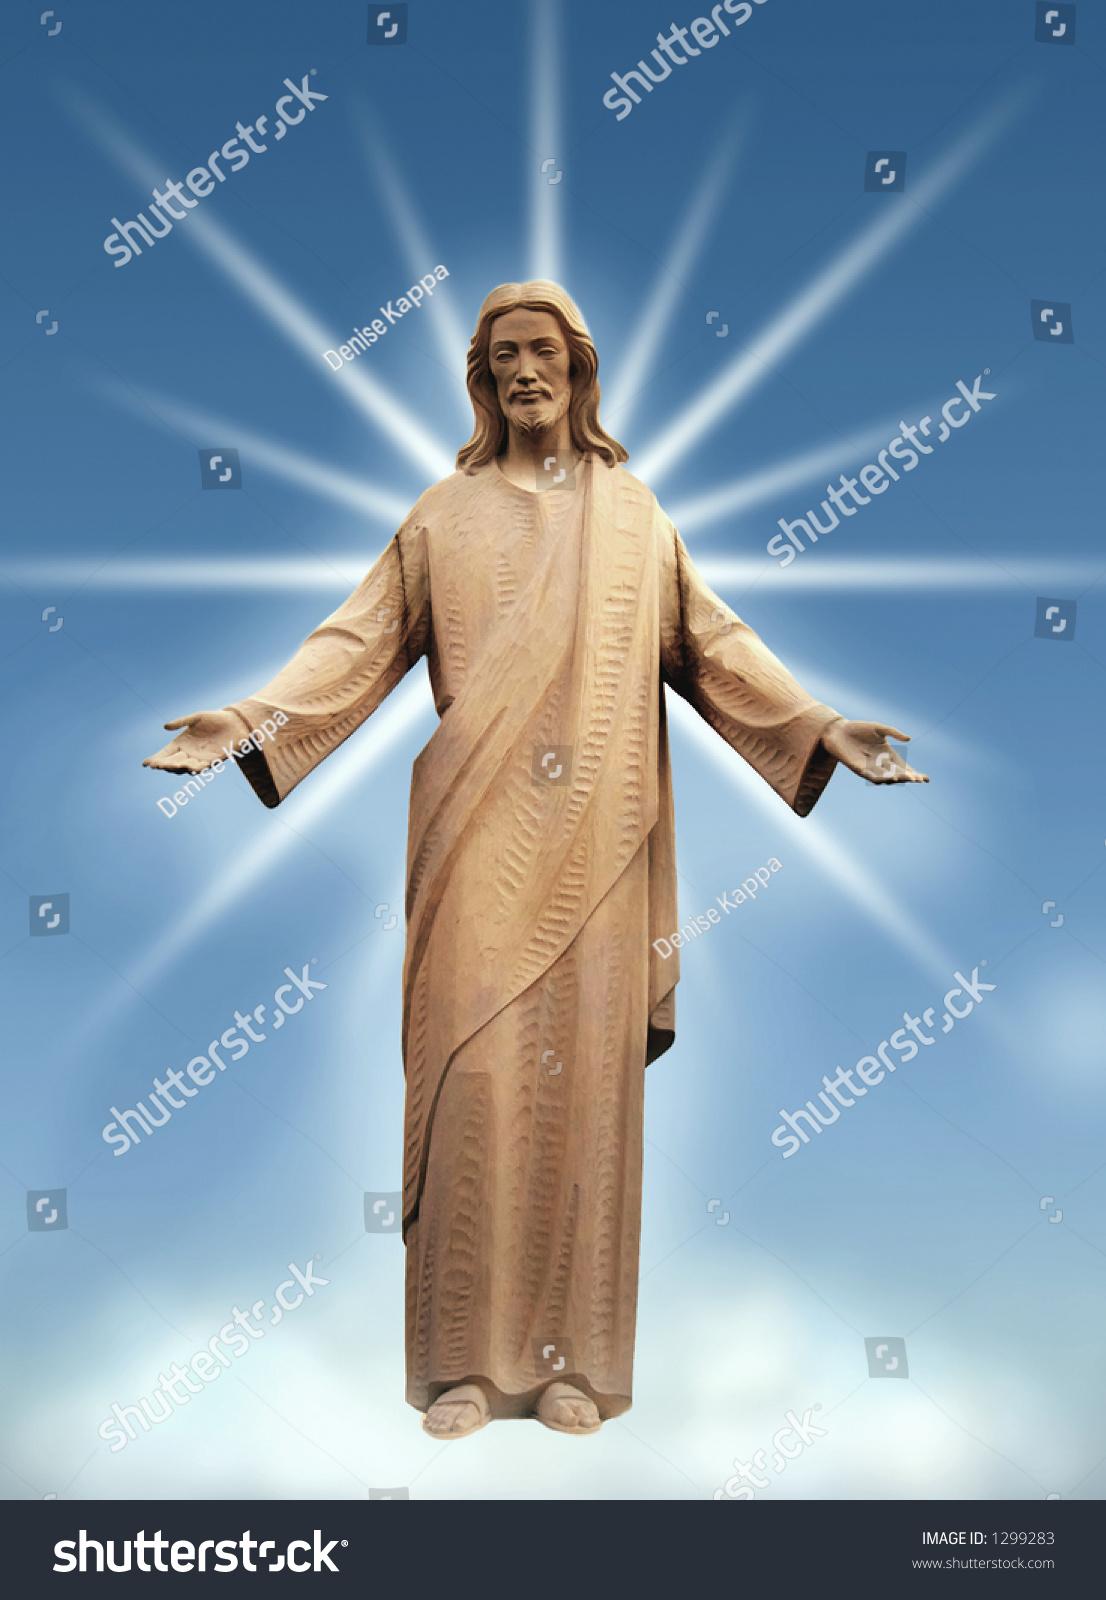 Jesus God Beaming Down His Graces Stock Photo 1299283